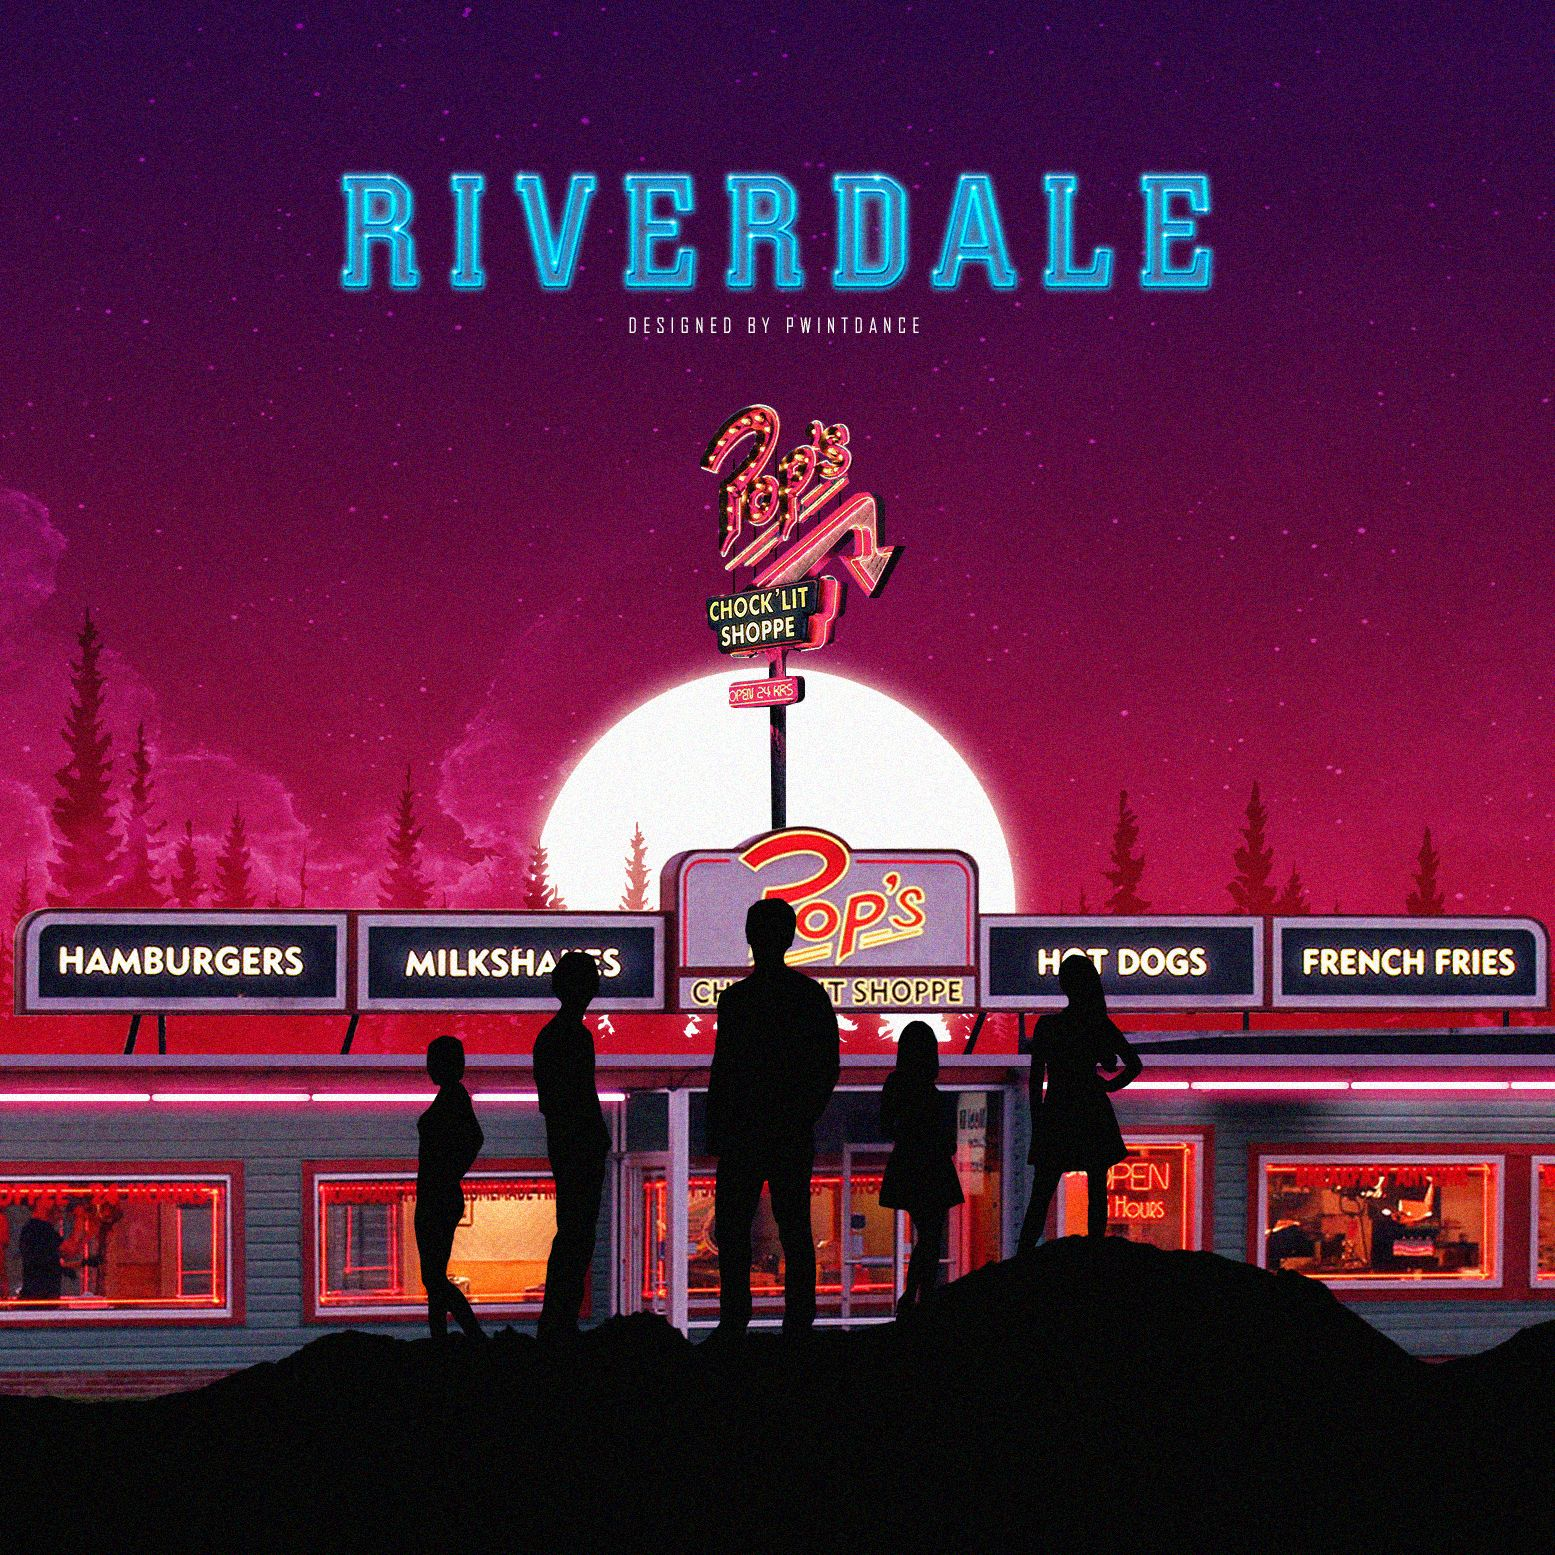 Riverdale Tumblr Wallpaper Pc